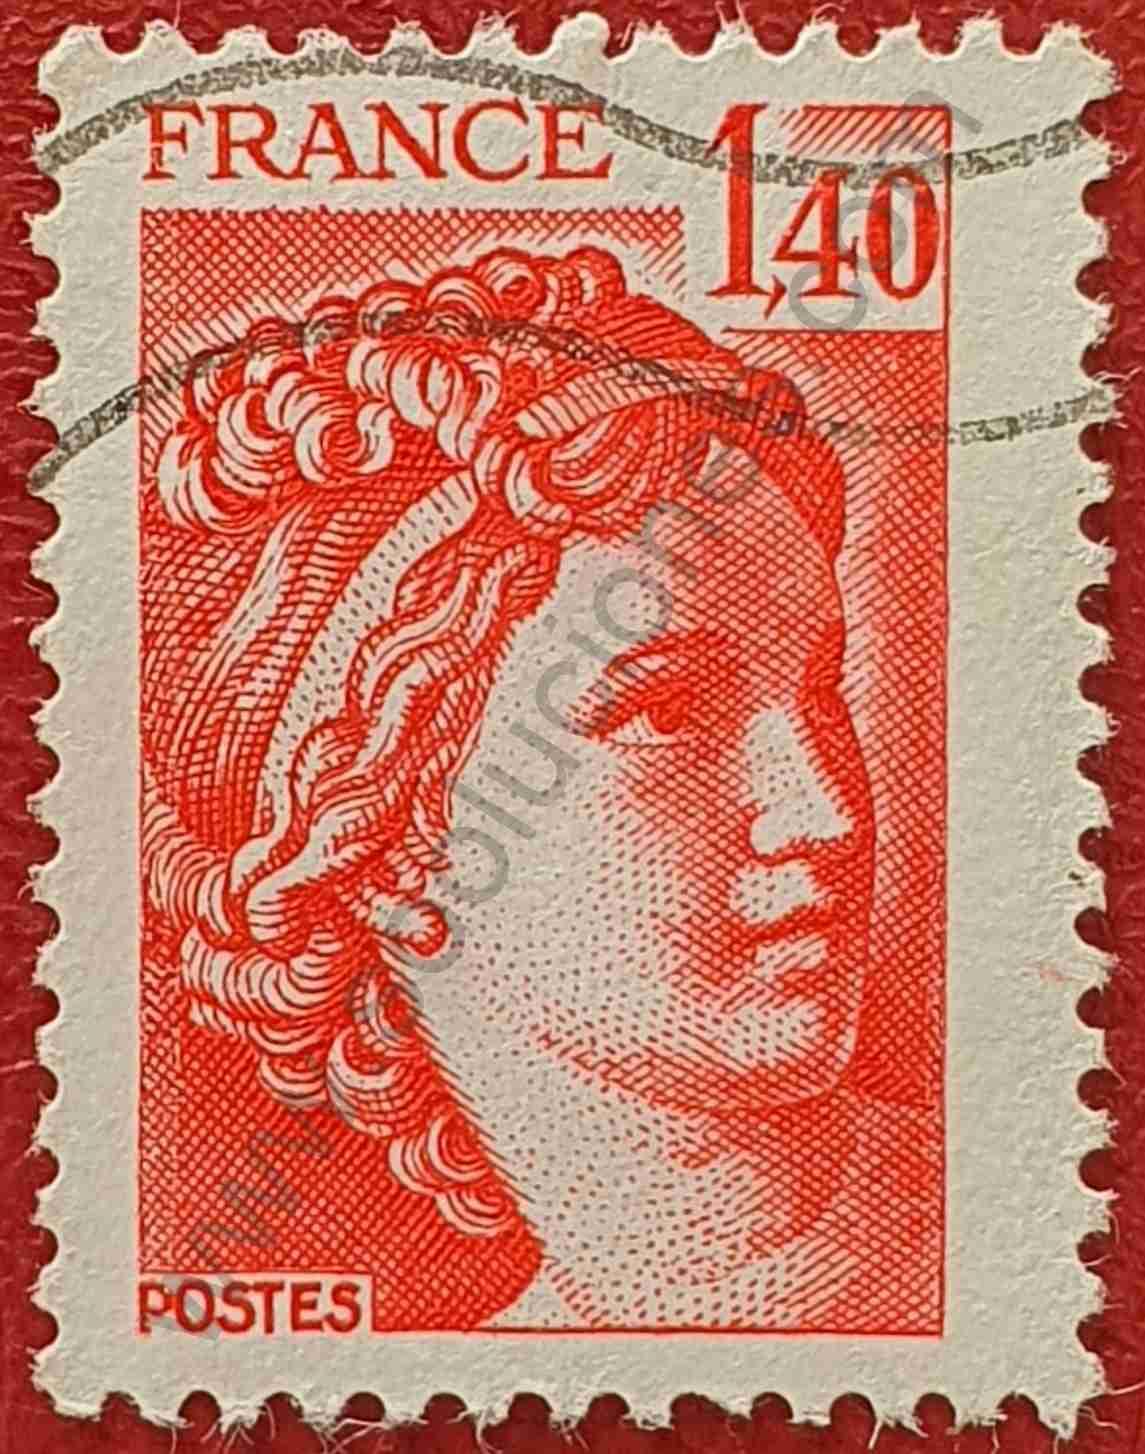 Sabine 1'40 - Sello Francia 1980